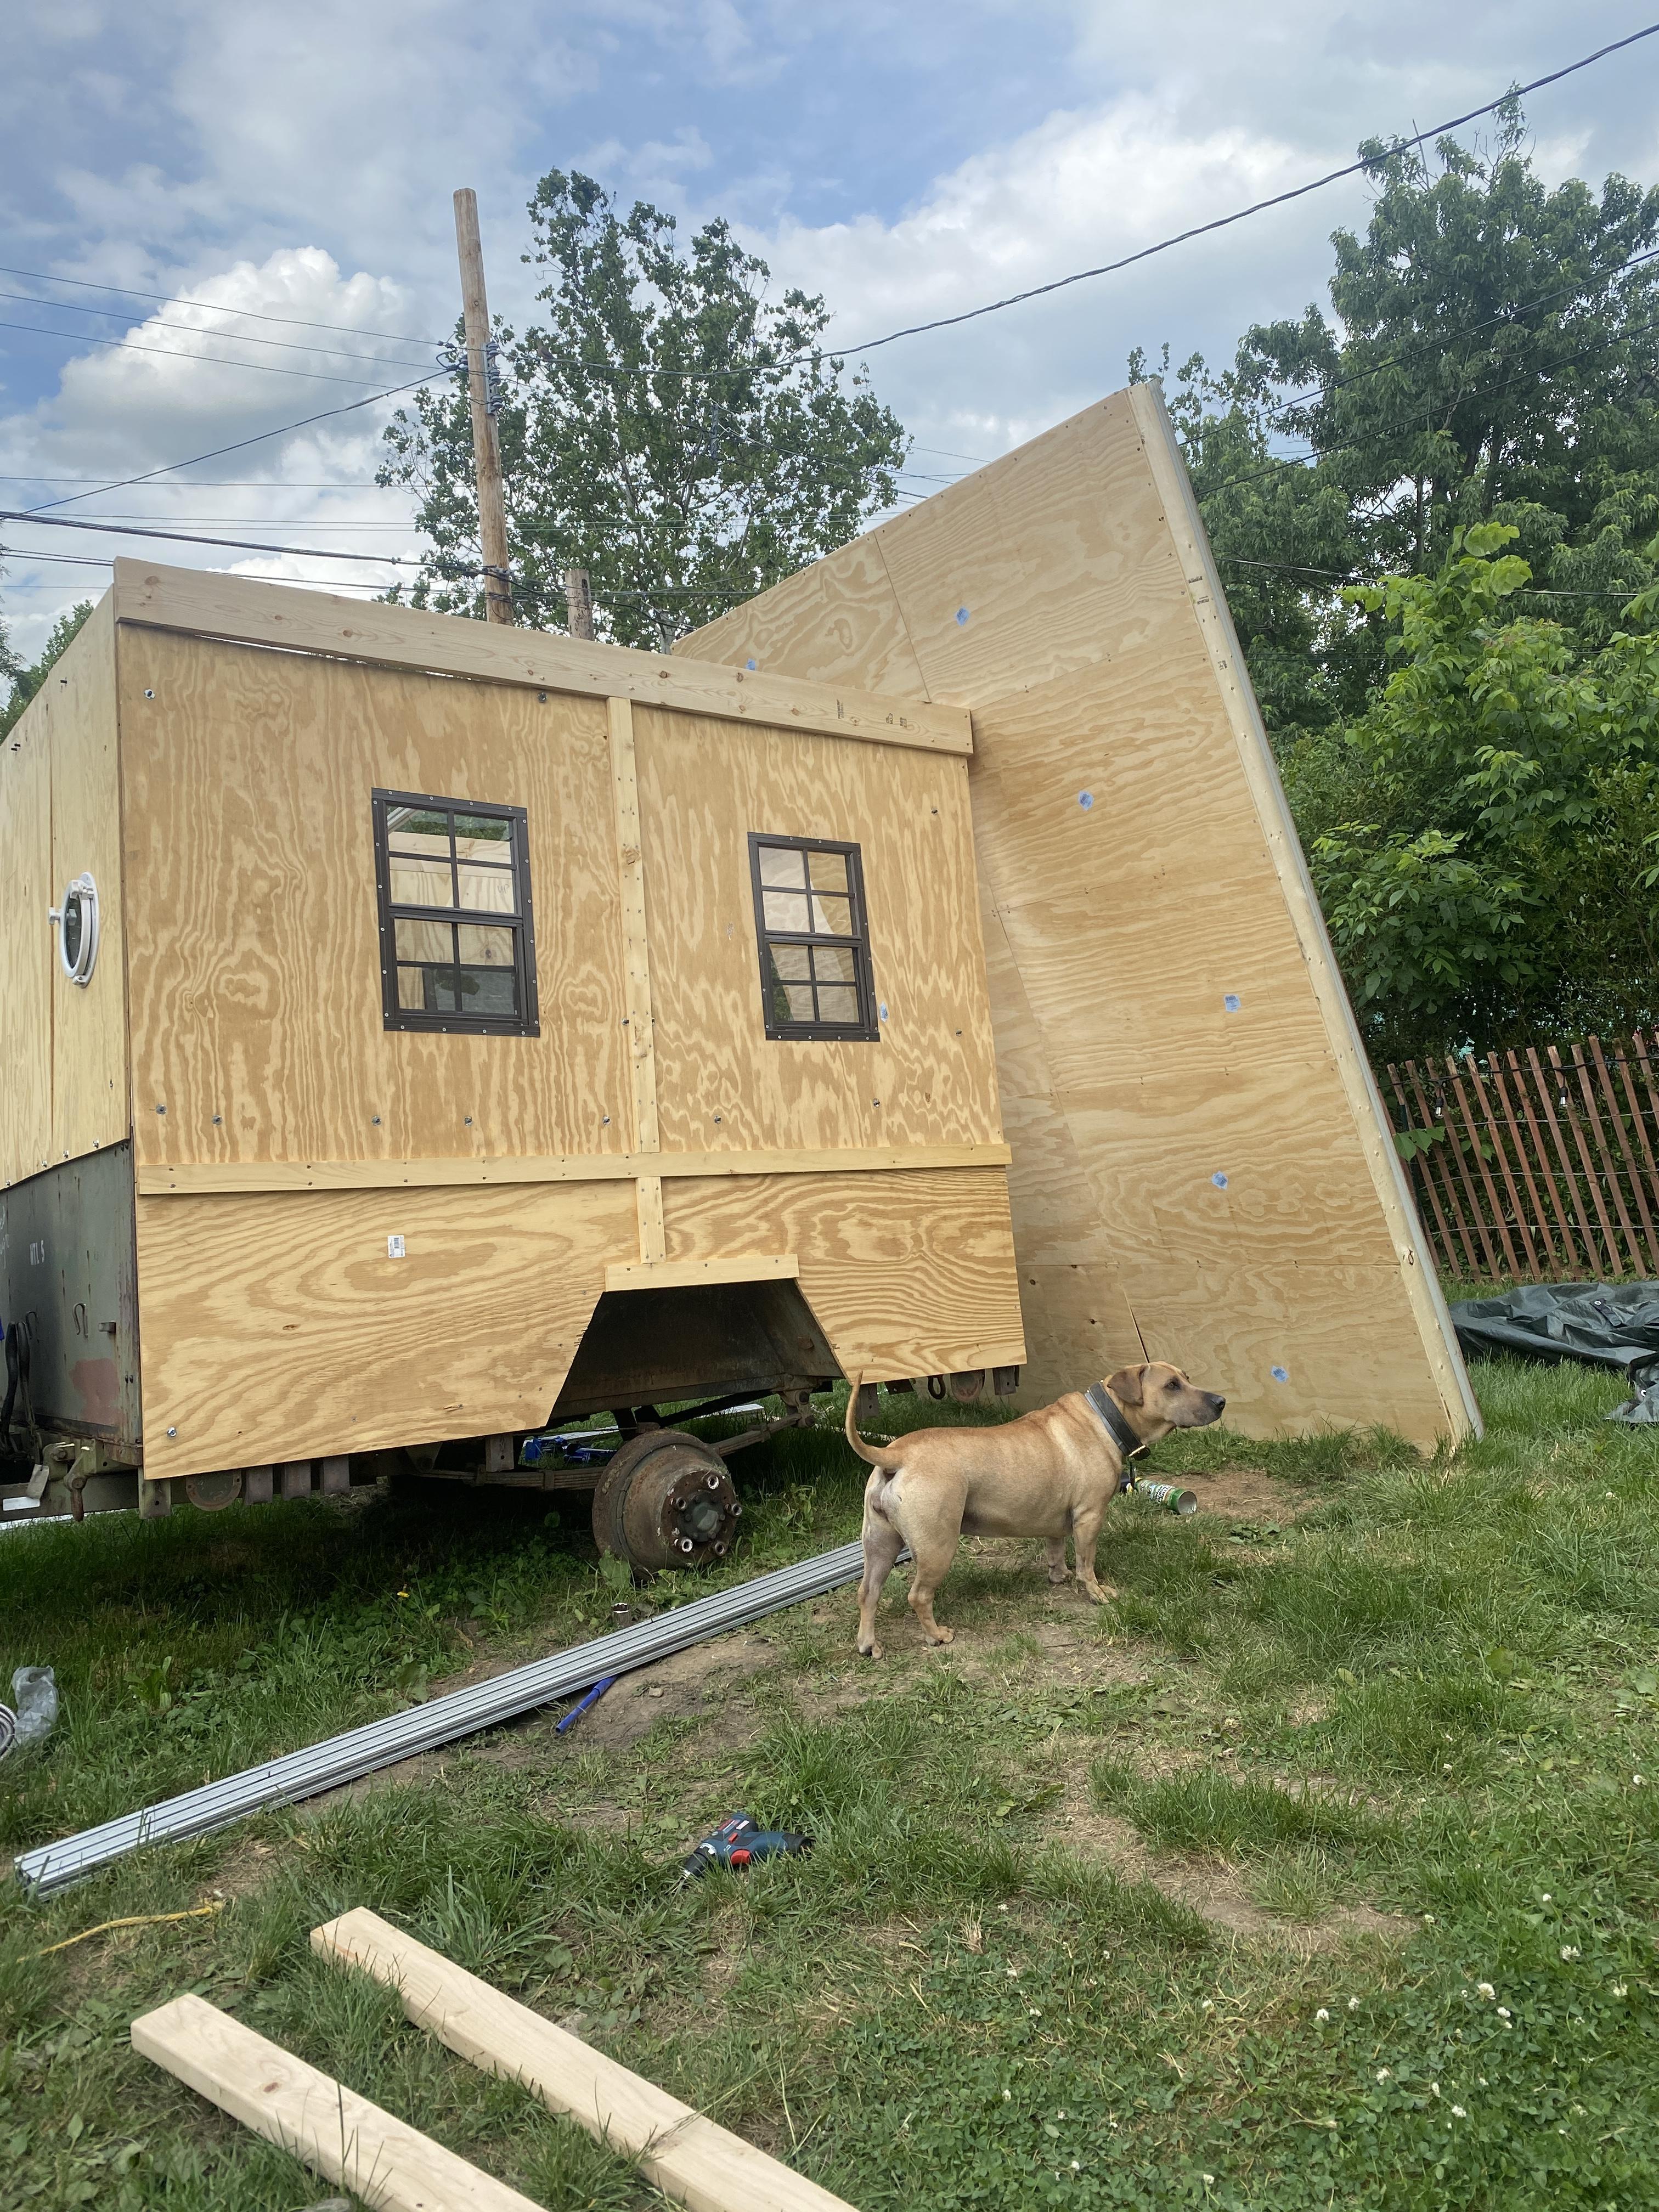 Diy overland camper on military trailer-1f477b05-bf29-4eb5-80d4-4a4fdbea174a_1593351171337.jpeg